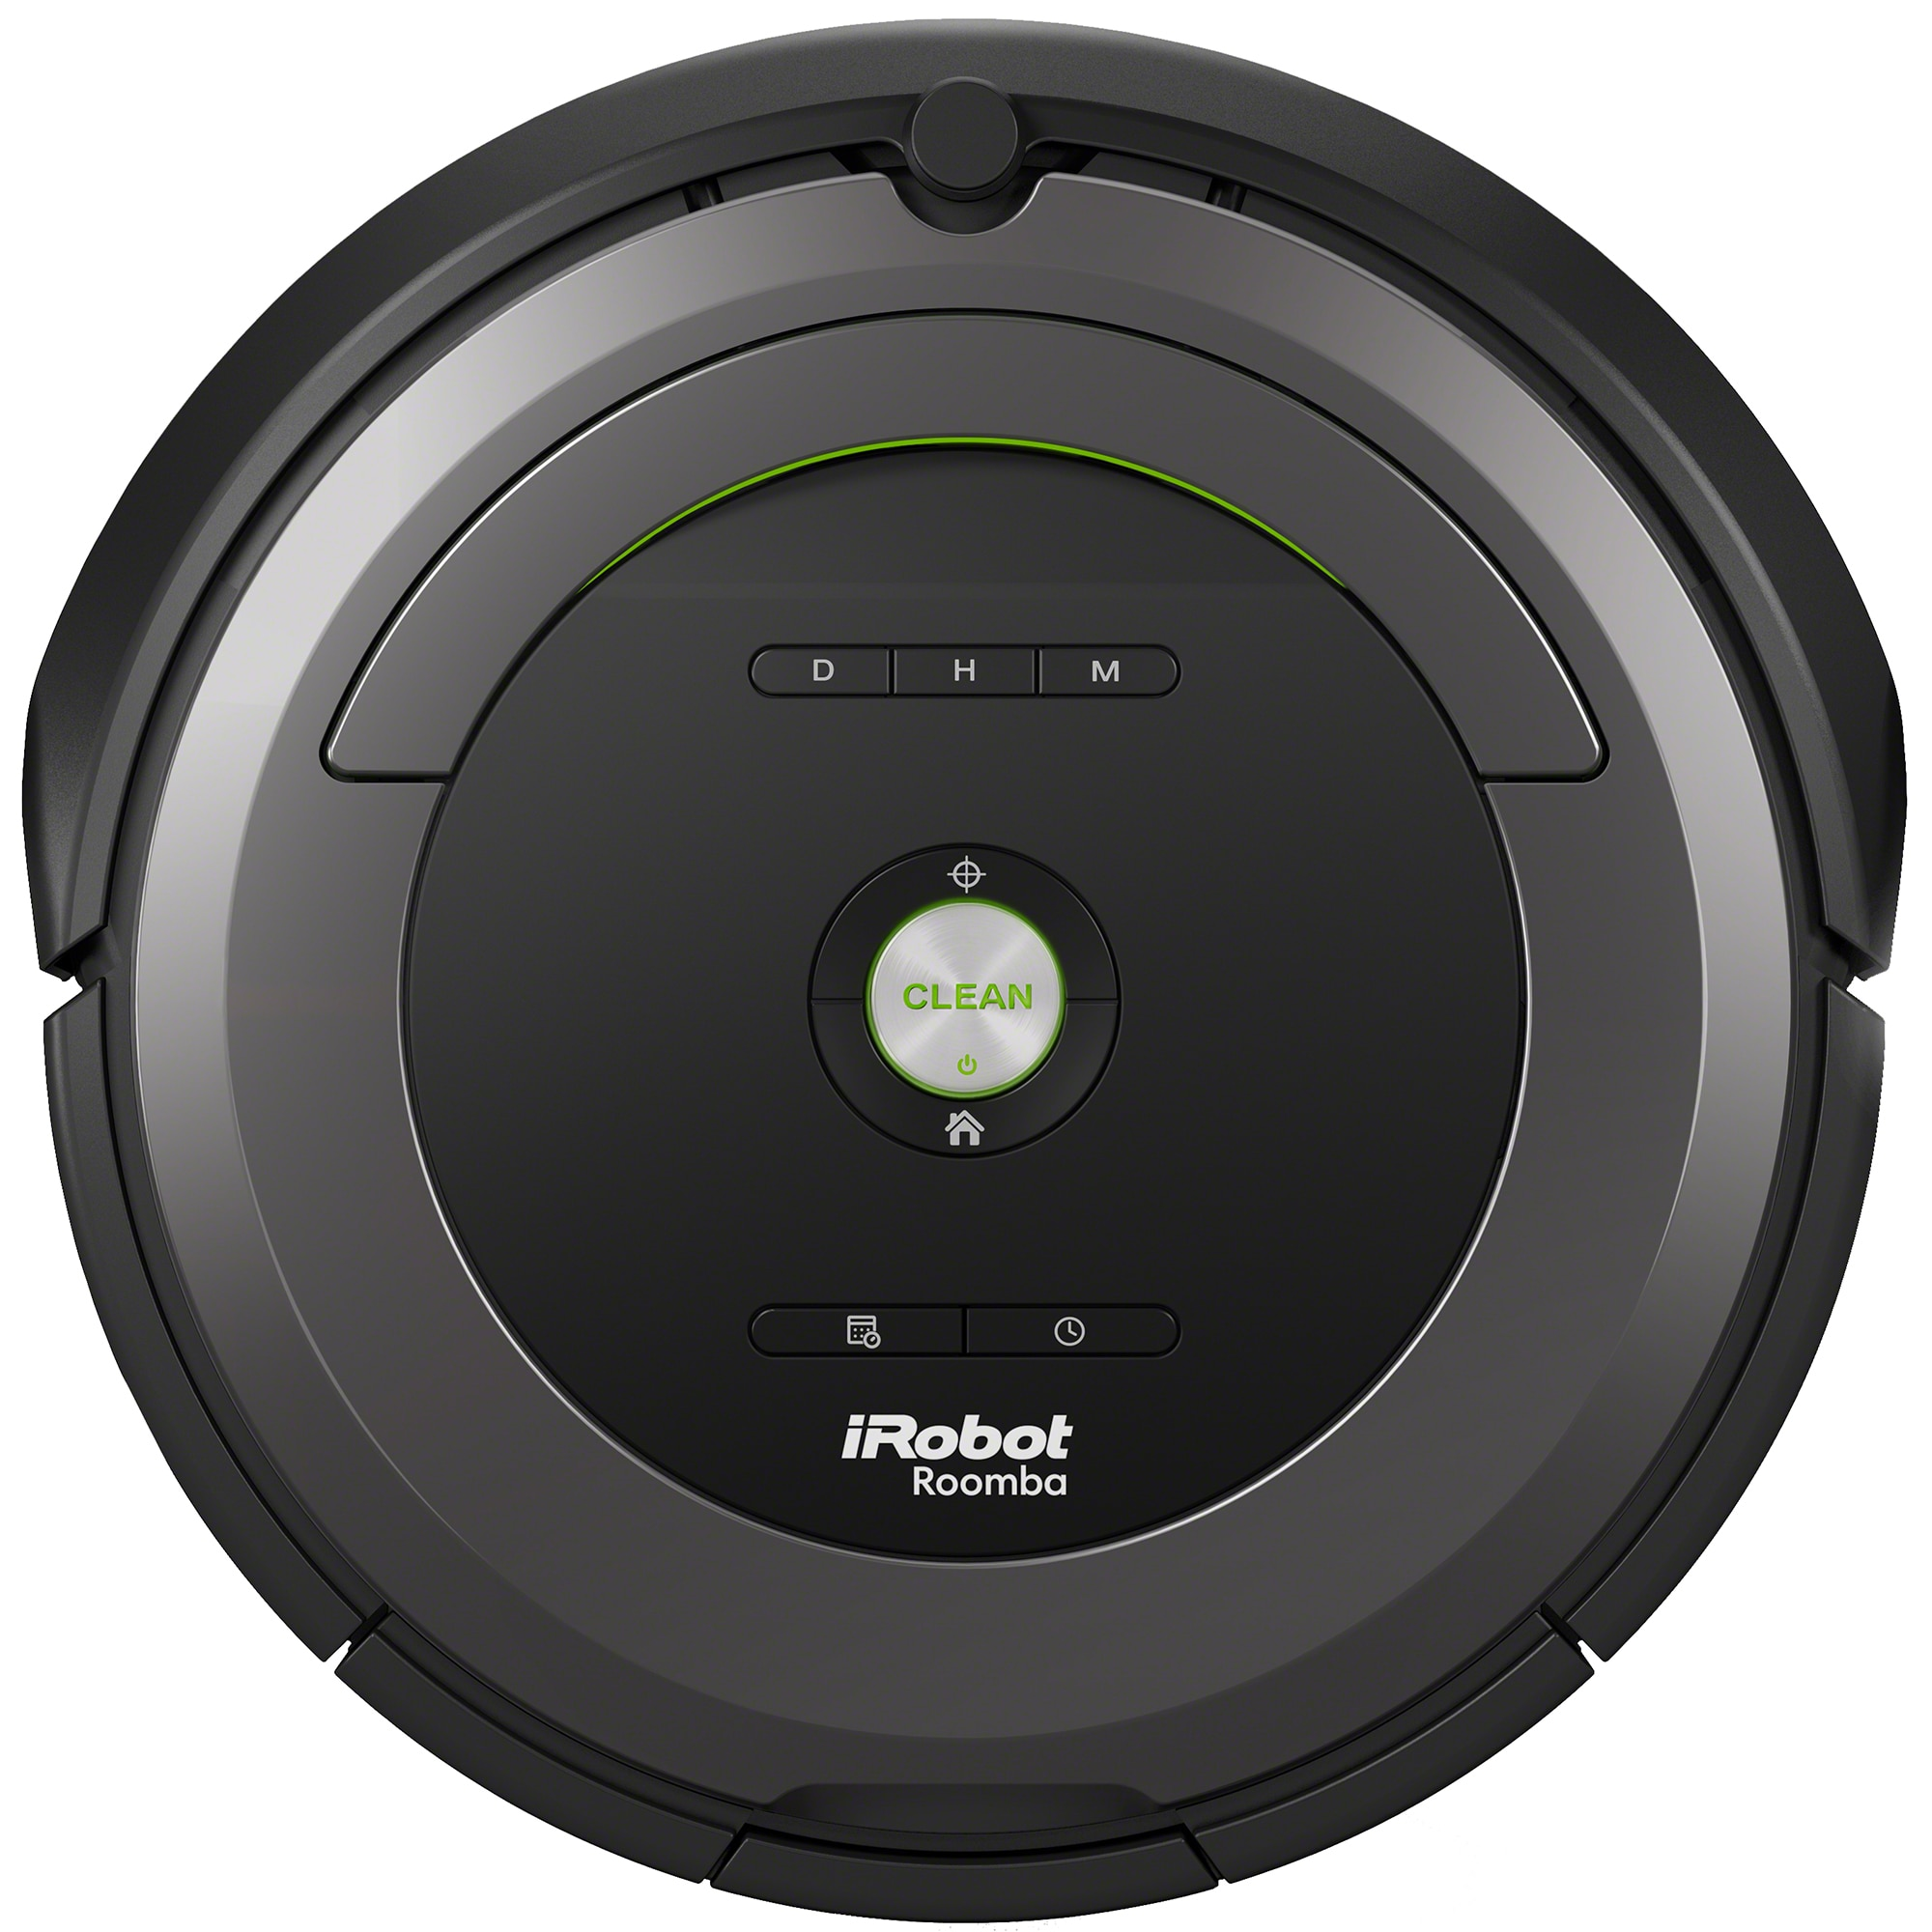 Fotografie Robot de aspirare iRobot Roomba Antiangle 681, AeroVac, Detectare acustica, iAdapt, Argintiu/Negru